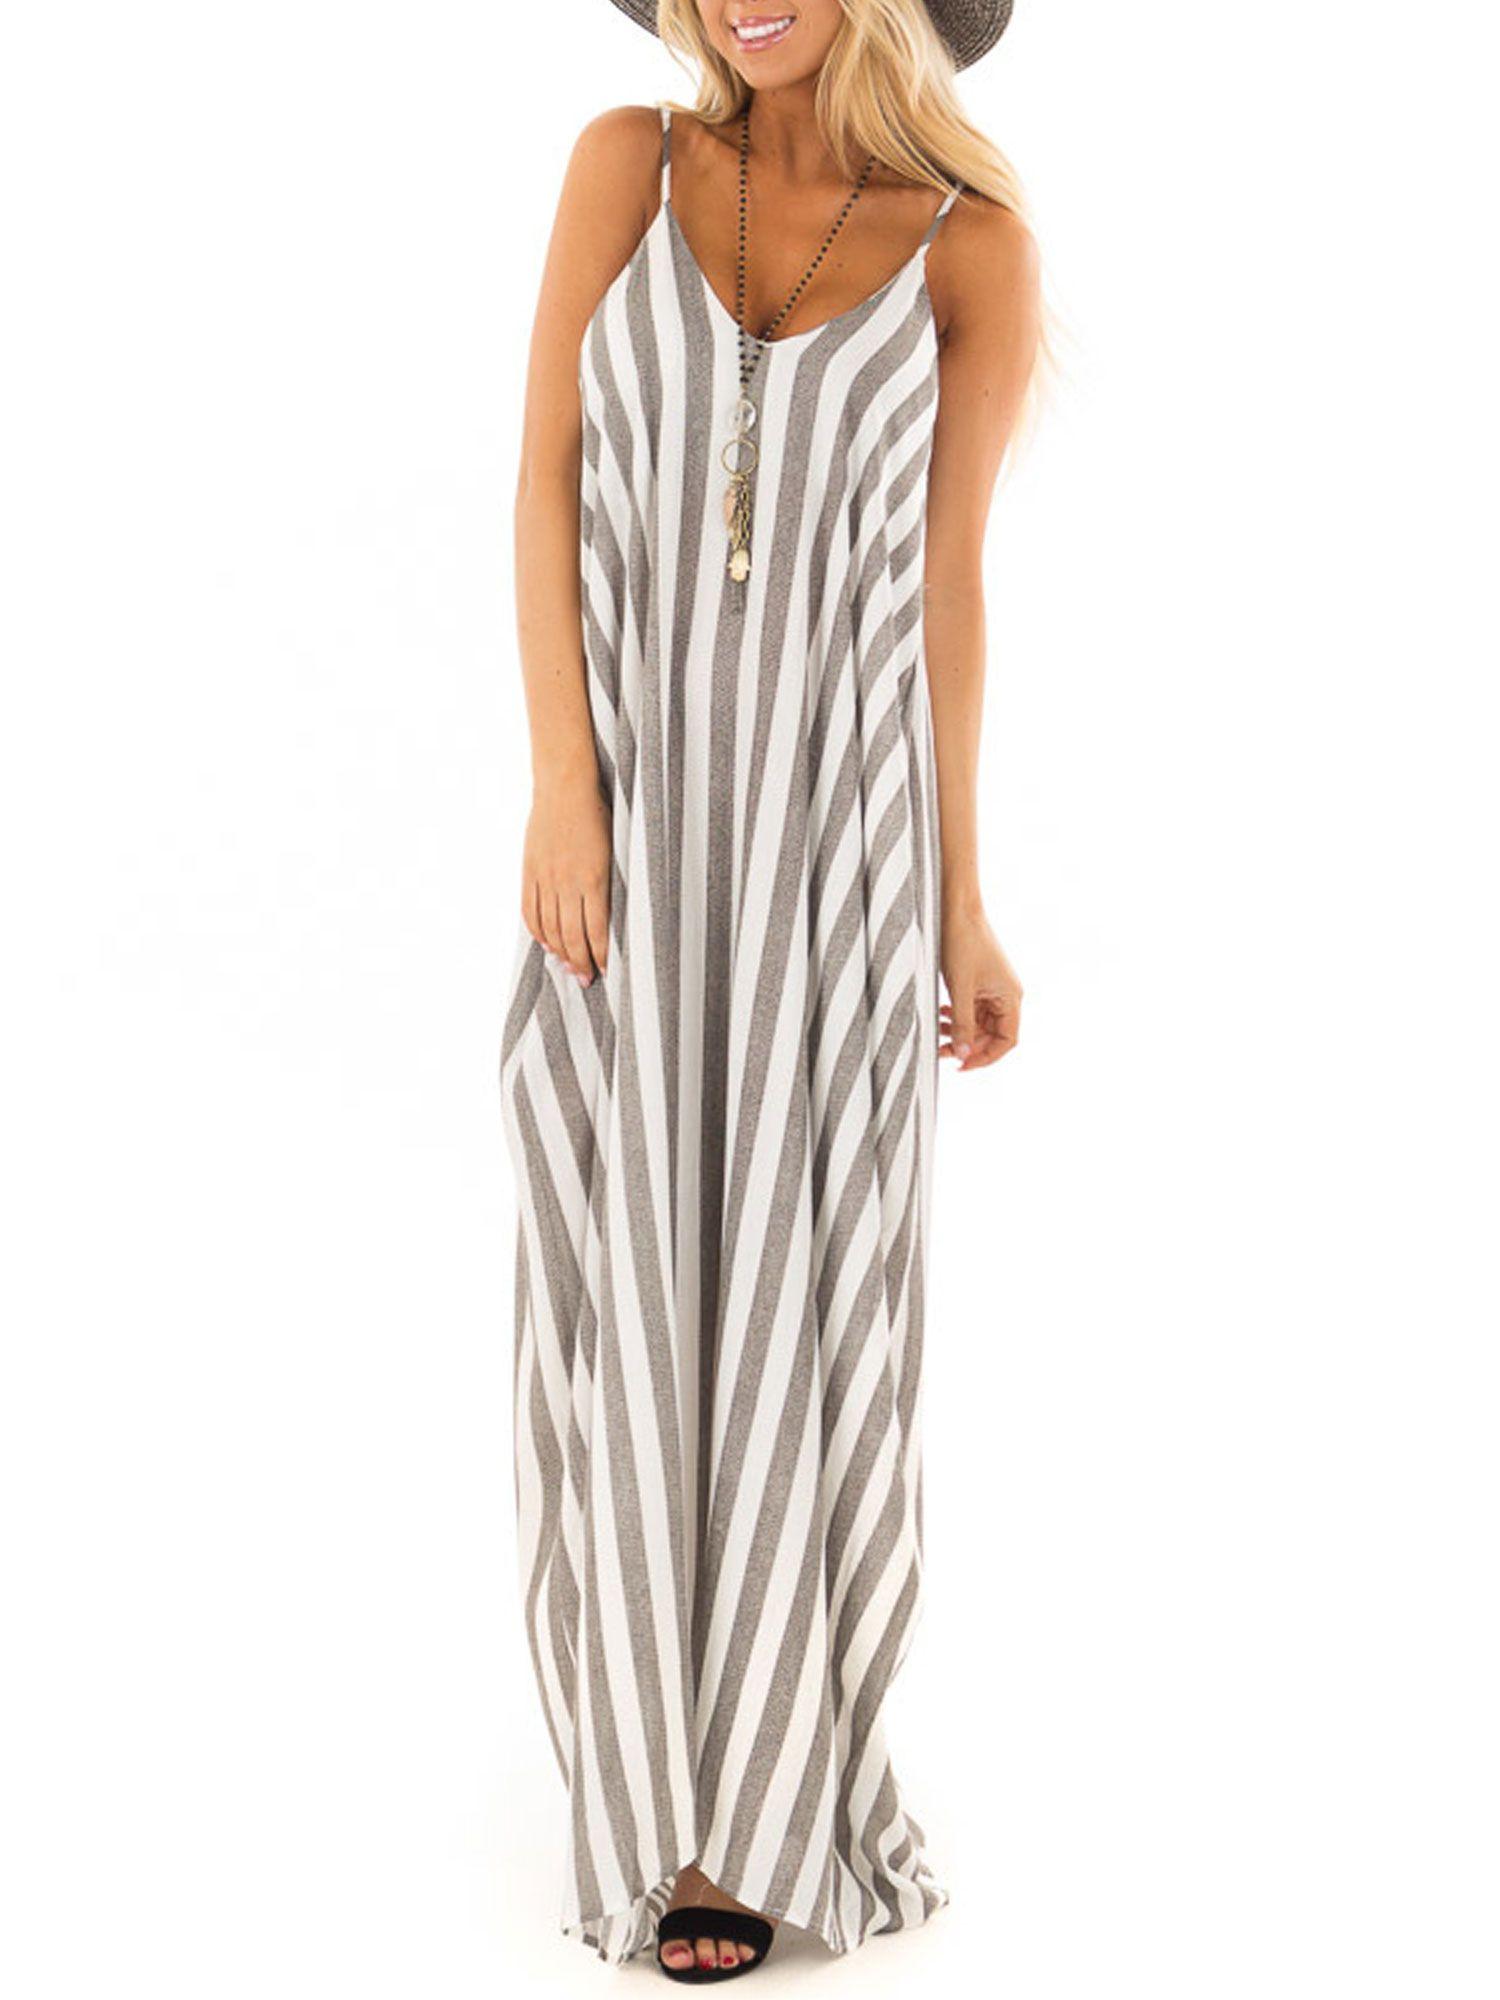 Himone Summer Holiday Women Strappy Cami Striped Long Boho Dress Ladies Beach Maxi Sundress Walmart Com Maxi Dress Evening Summer Dresses Beach Dresses [ 2000 x 1500 Pixel ]